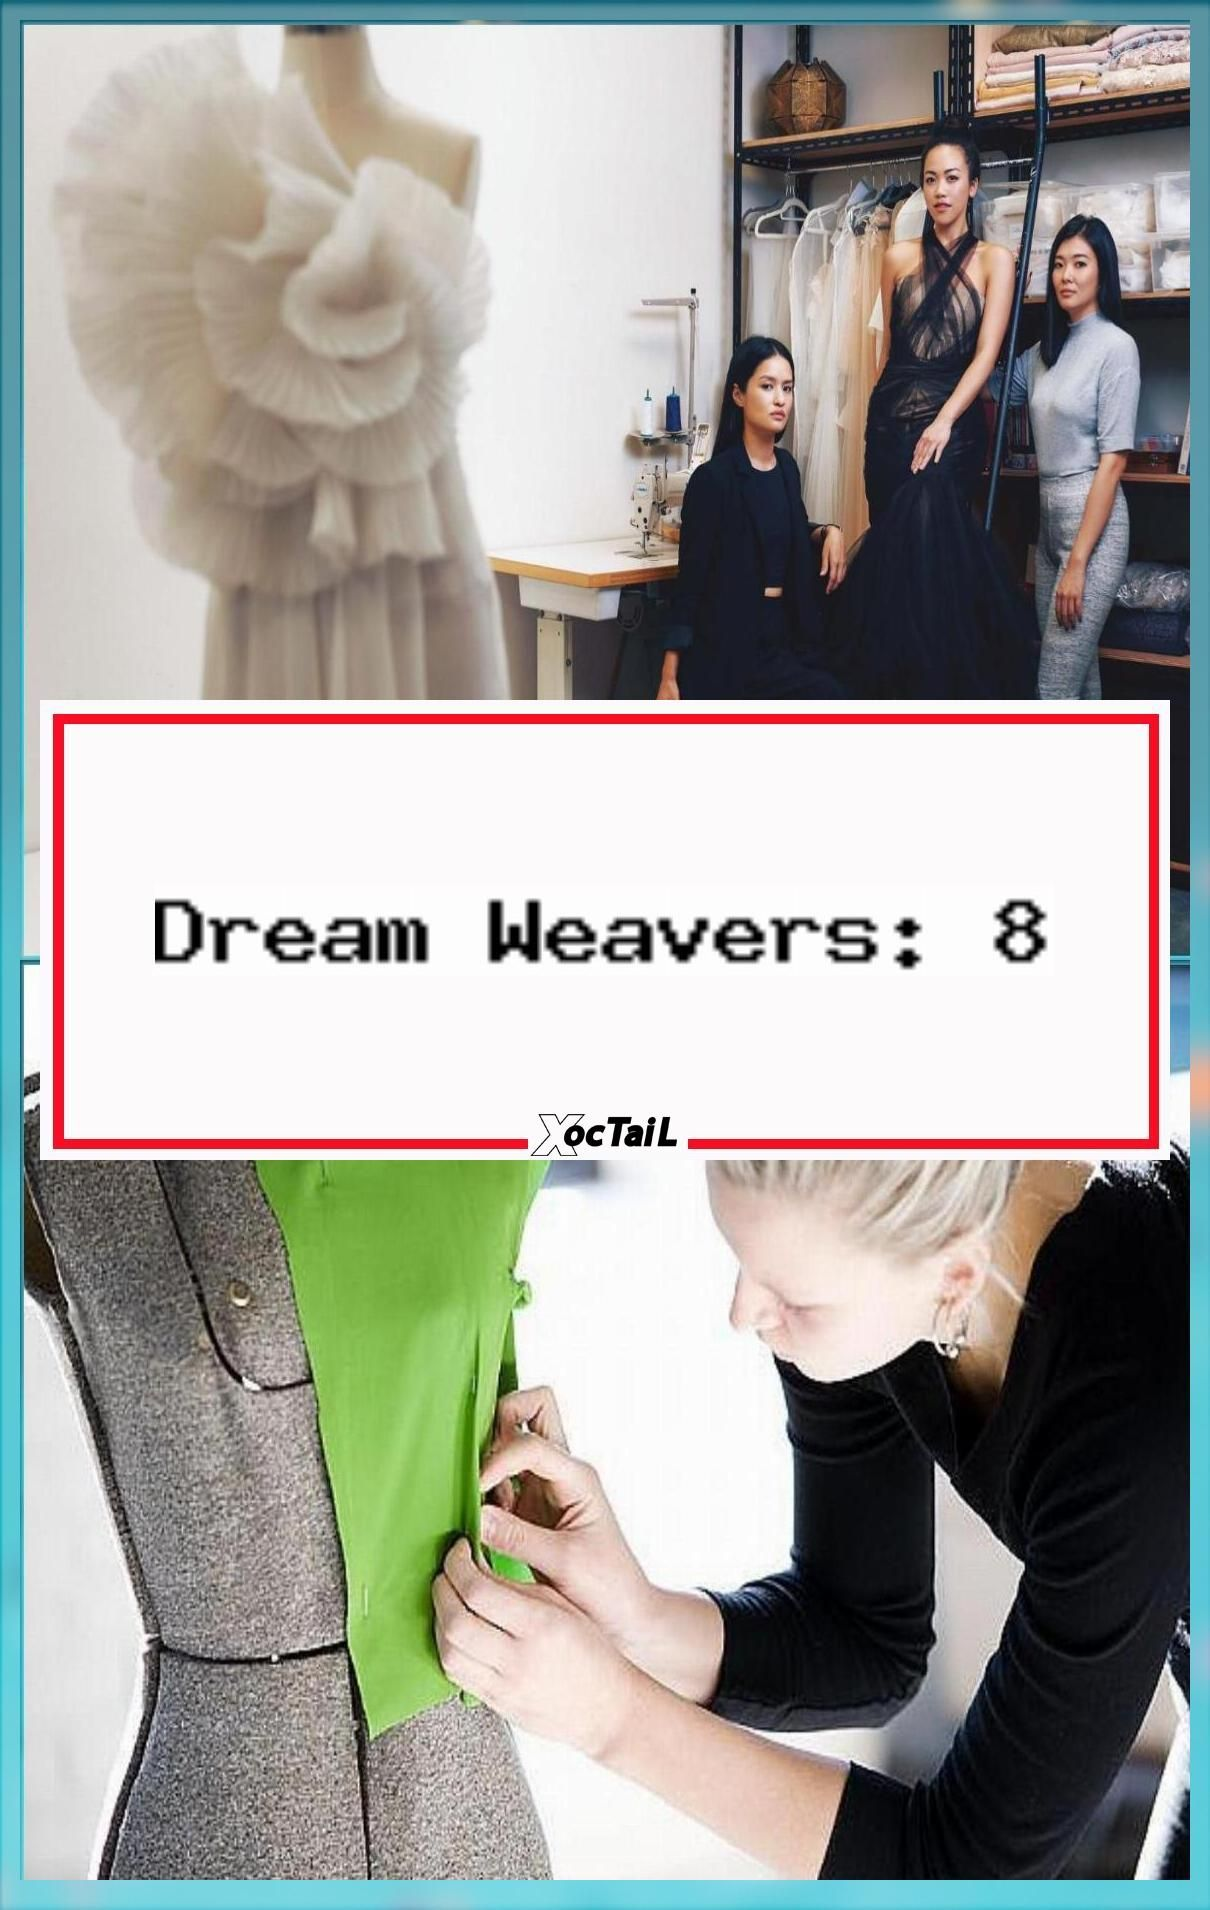 Dream Weavers 8 Of Asias Best Bespoke Fashion Designers Designer Job Description Clothes Designers In 2020 Fashion Designers Famous Famous Fashion Bespoke Fashion